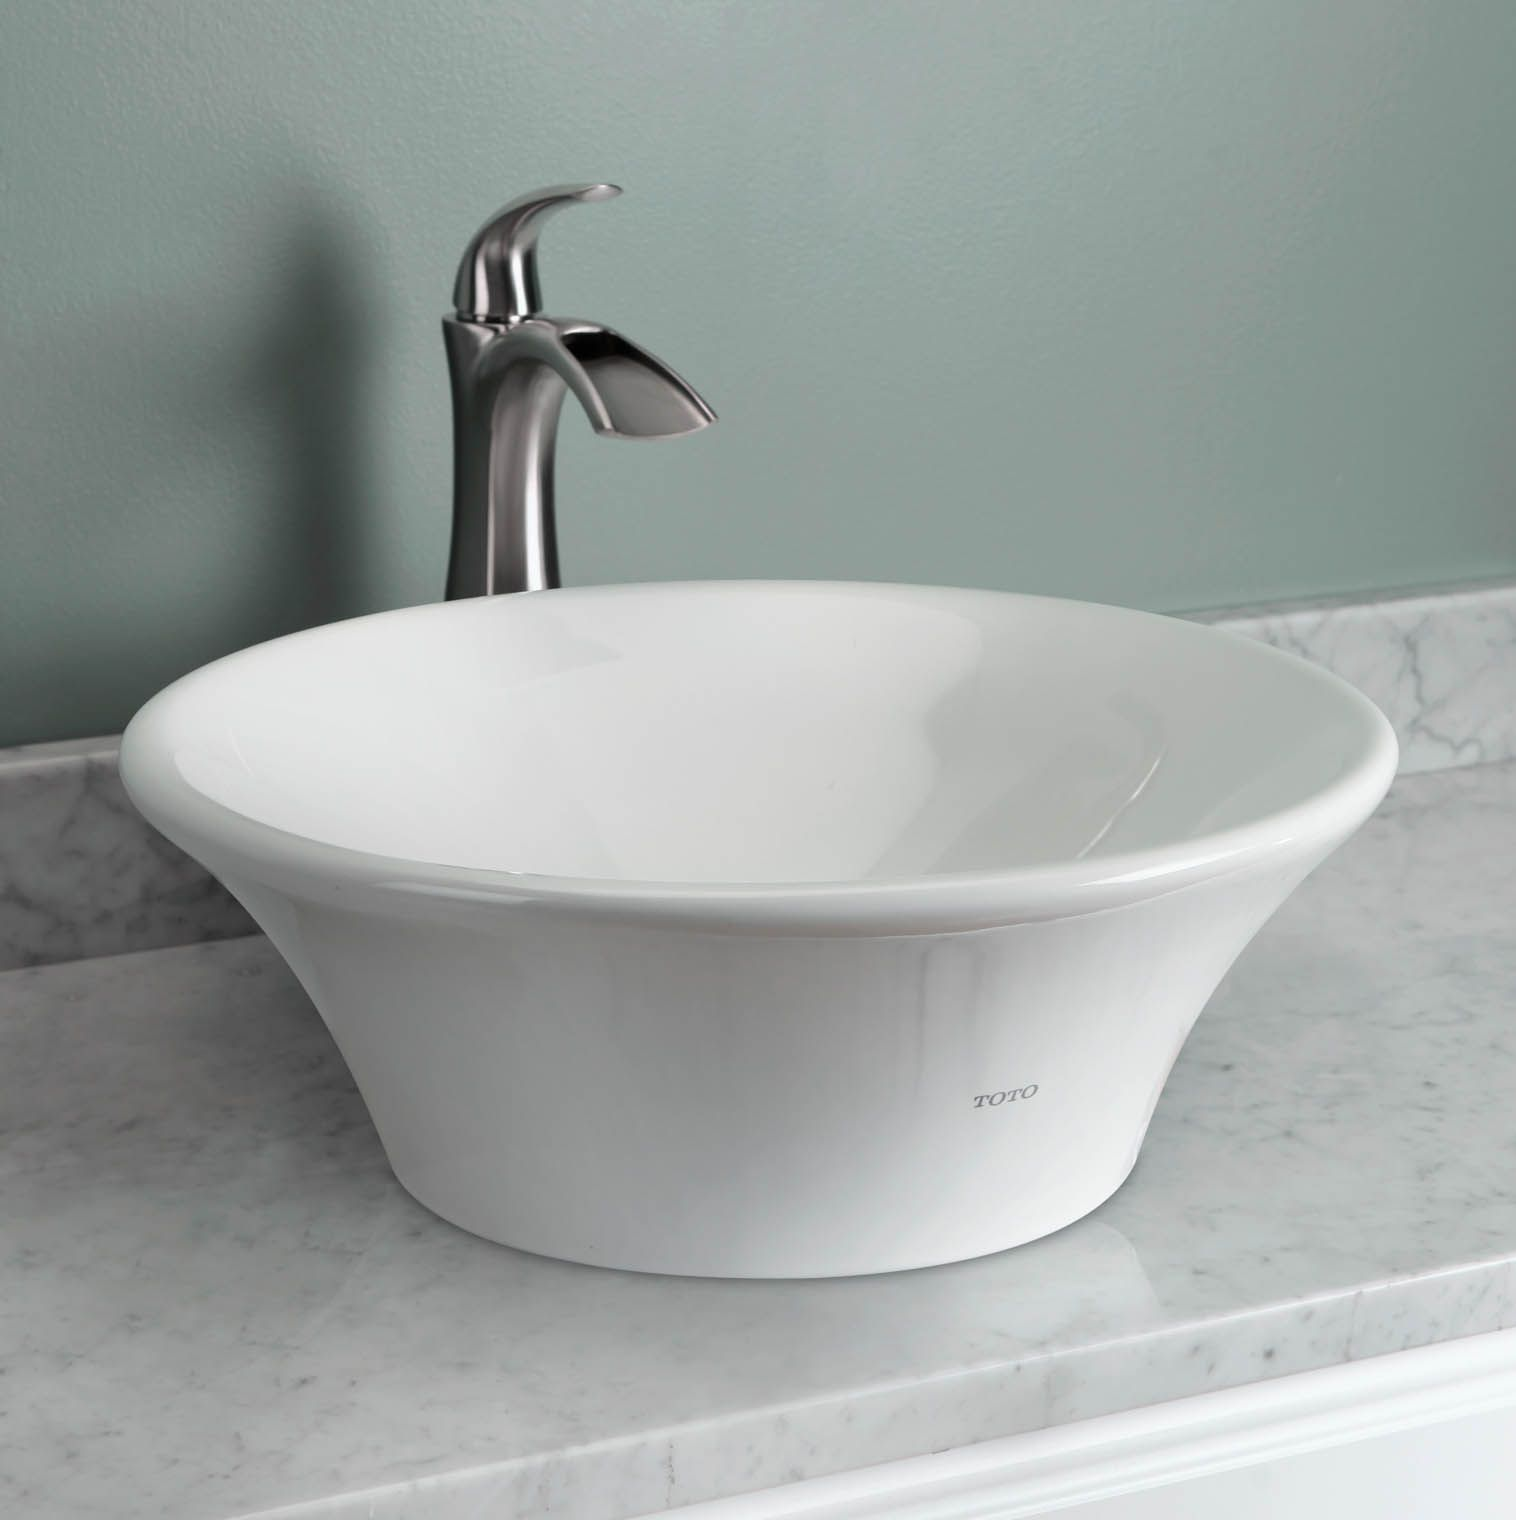 Buy Toto Lt524g 01 Alexis 17 3 4 Above Counter Bathroom Sink Kuchen Bader Bad